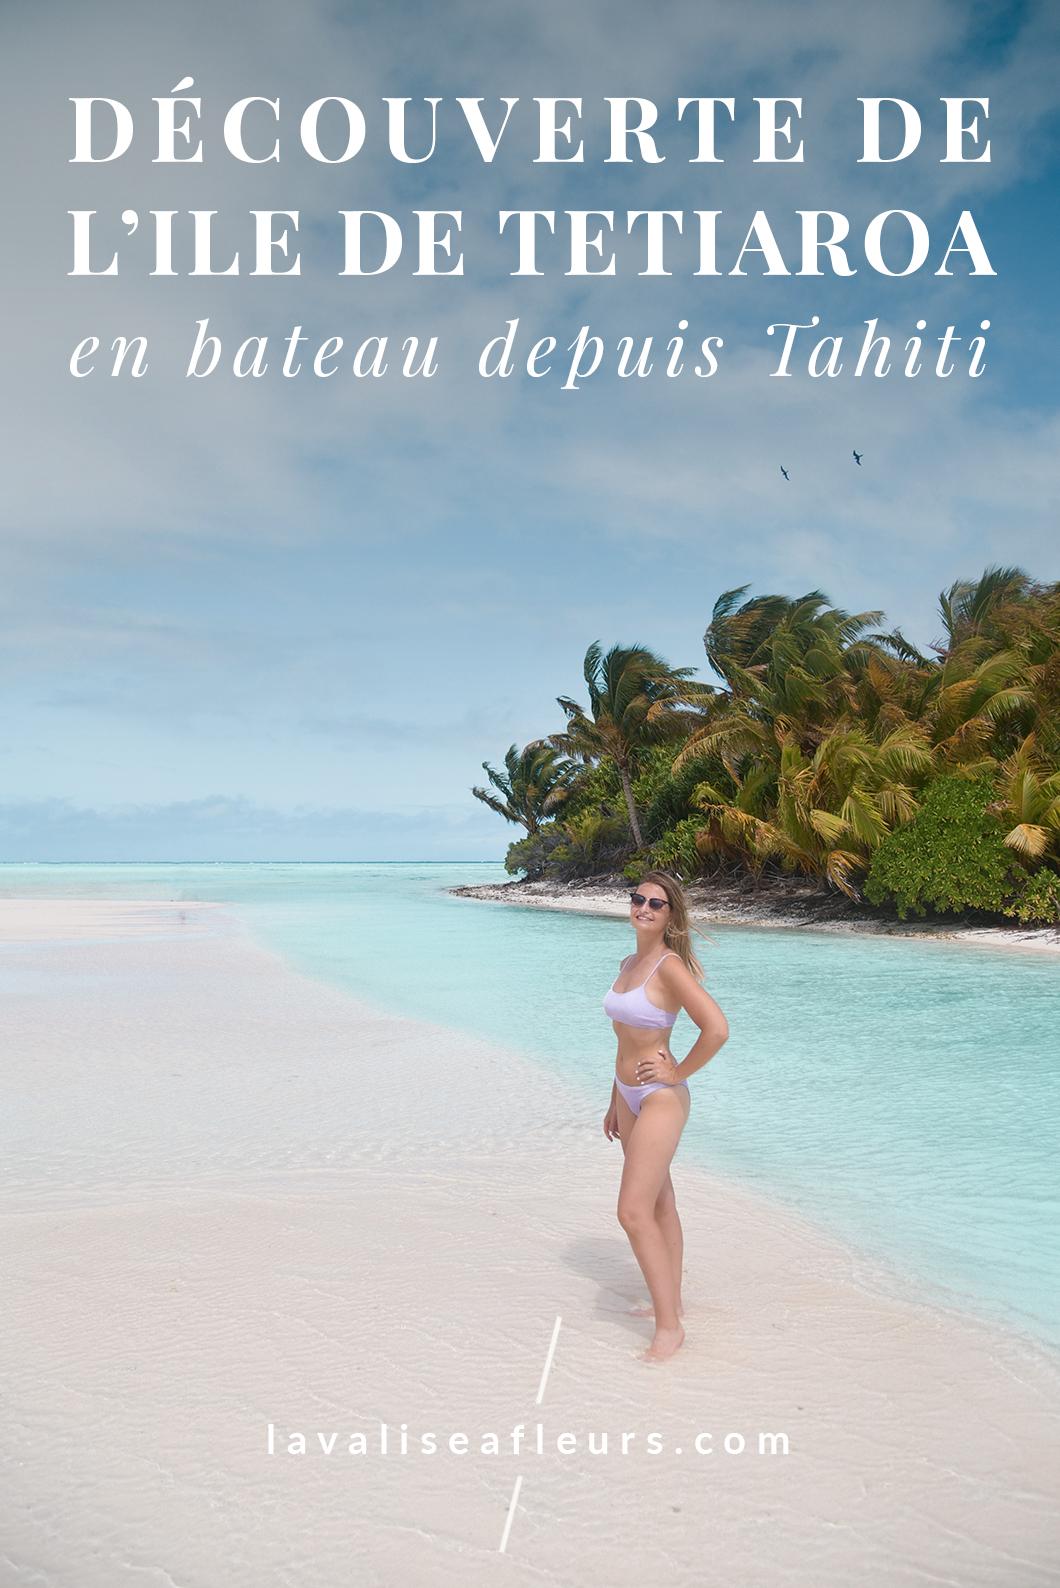 Découverte de l'ile de Tetiaroa en bateau depuis Tahiti